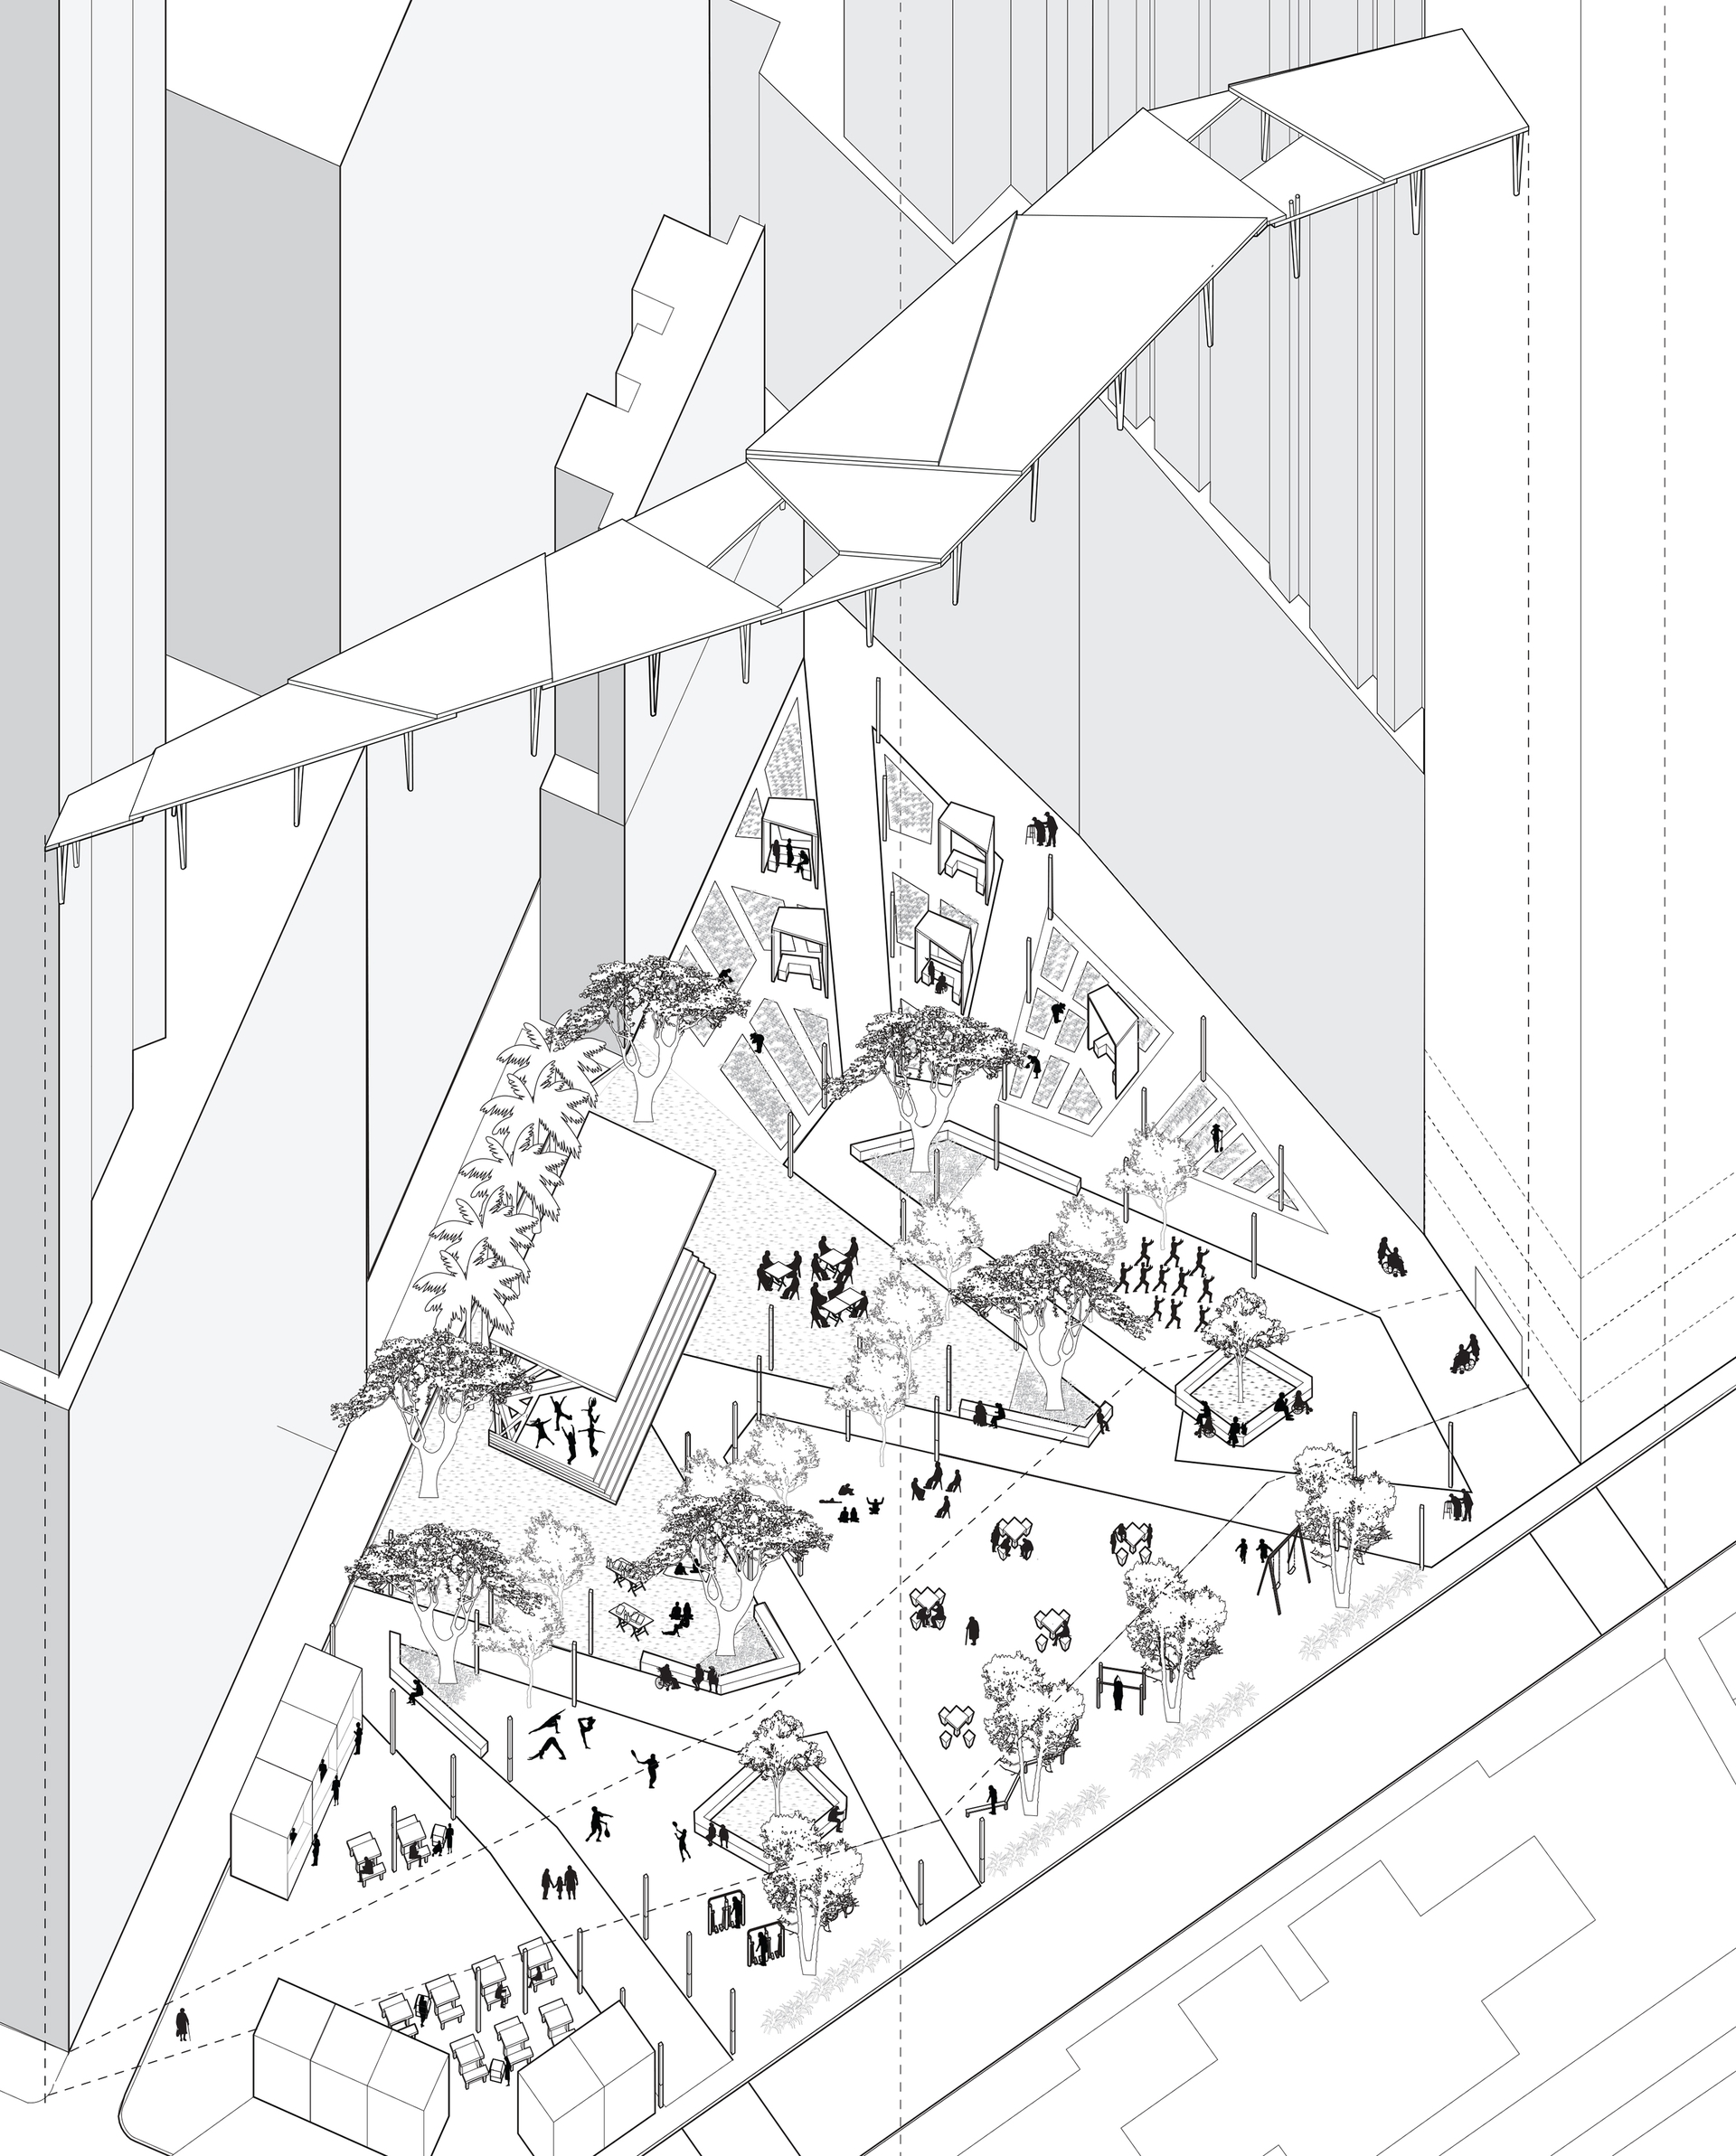 Enlarge Photo: Site design axon. By WONG Nok Yan.